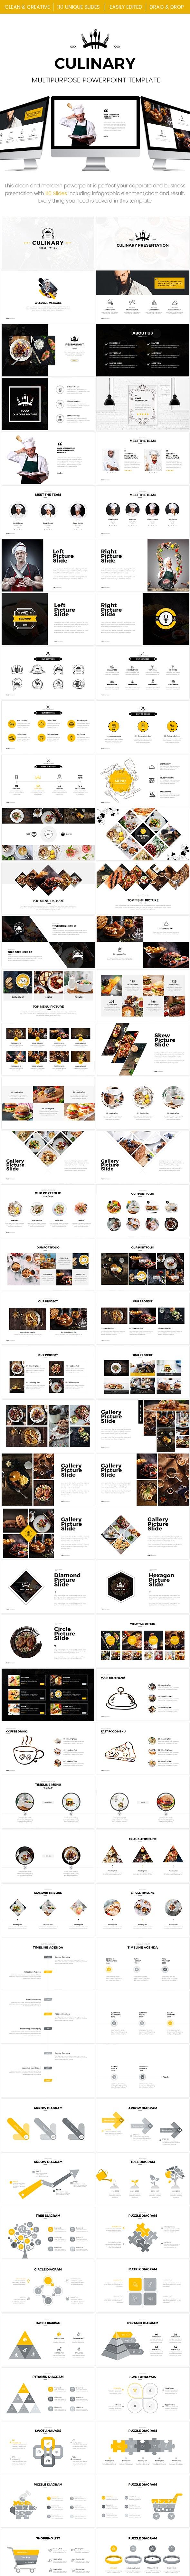 Culinary - MultipurposePowerpoint Template - PowerPoint Templates Presentation Templates